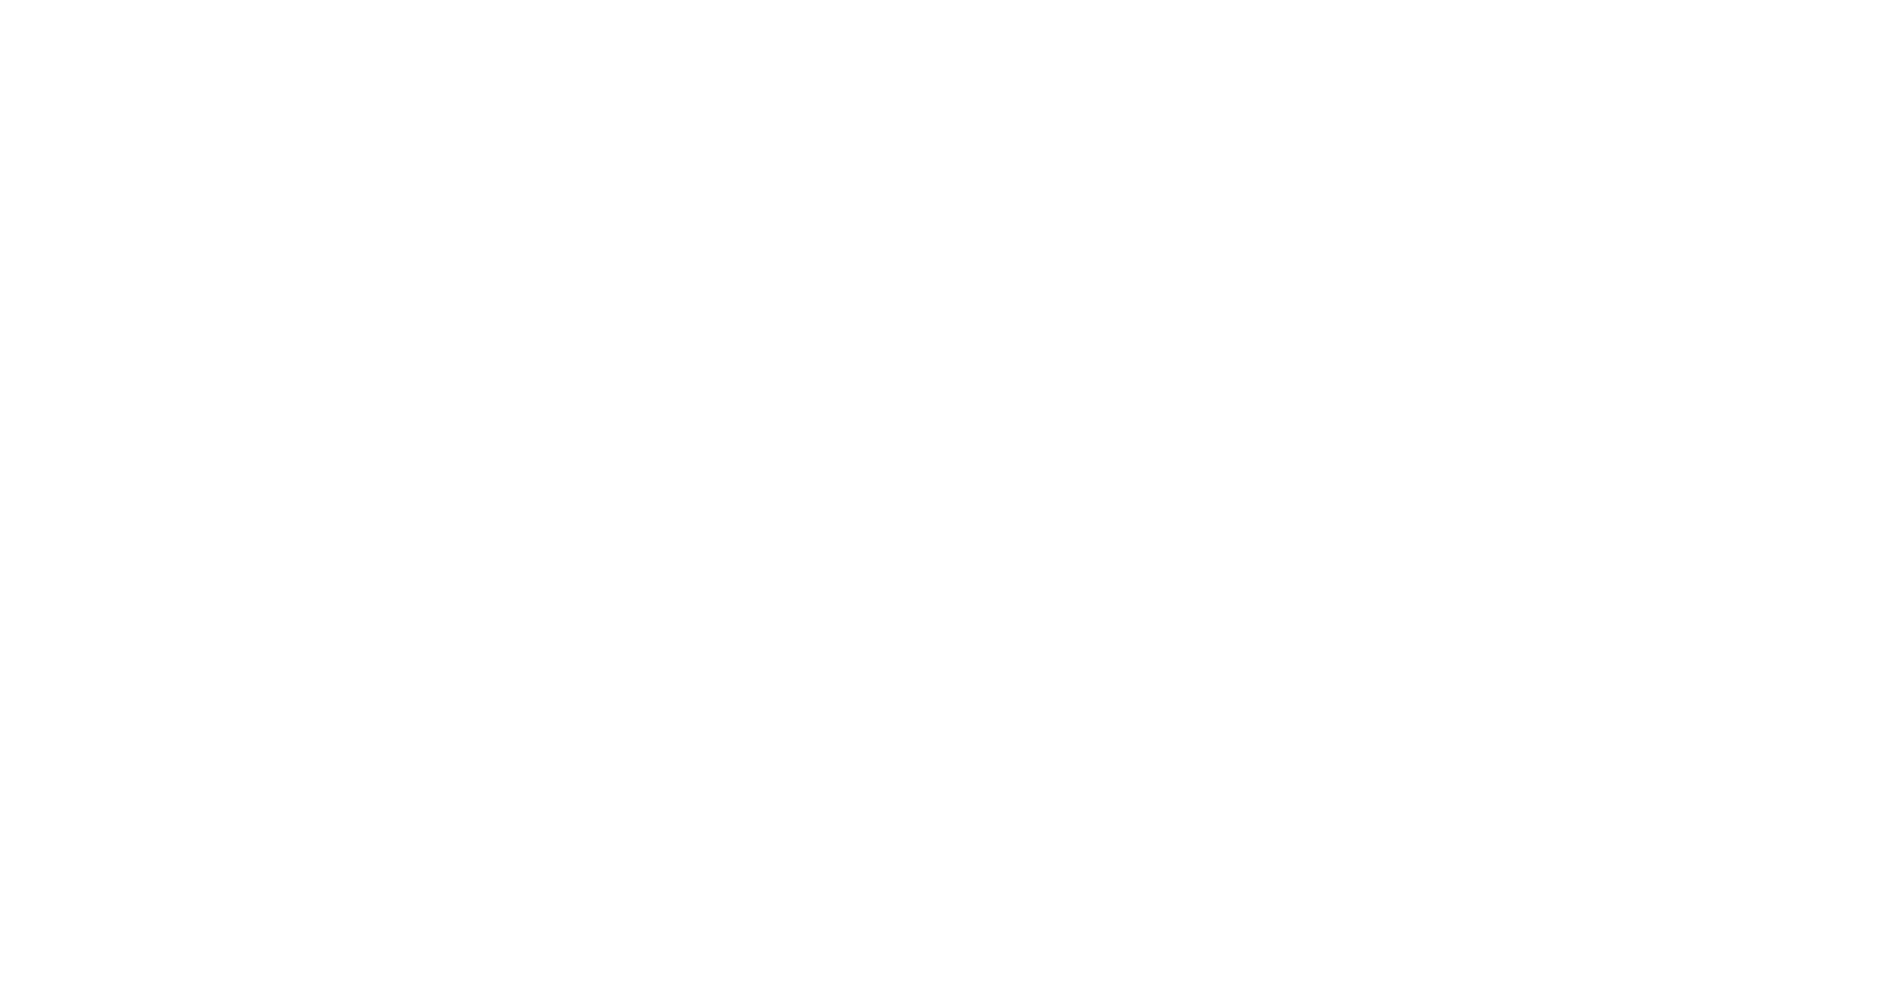 render2018_laurel.png